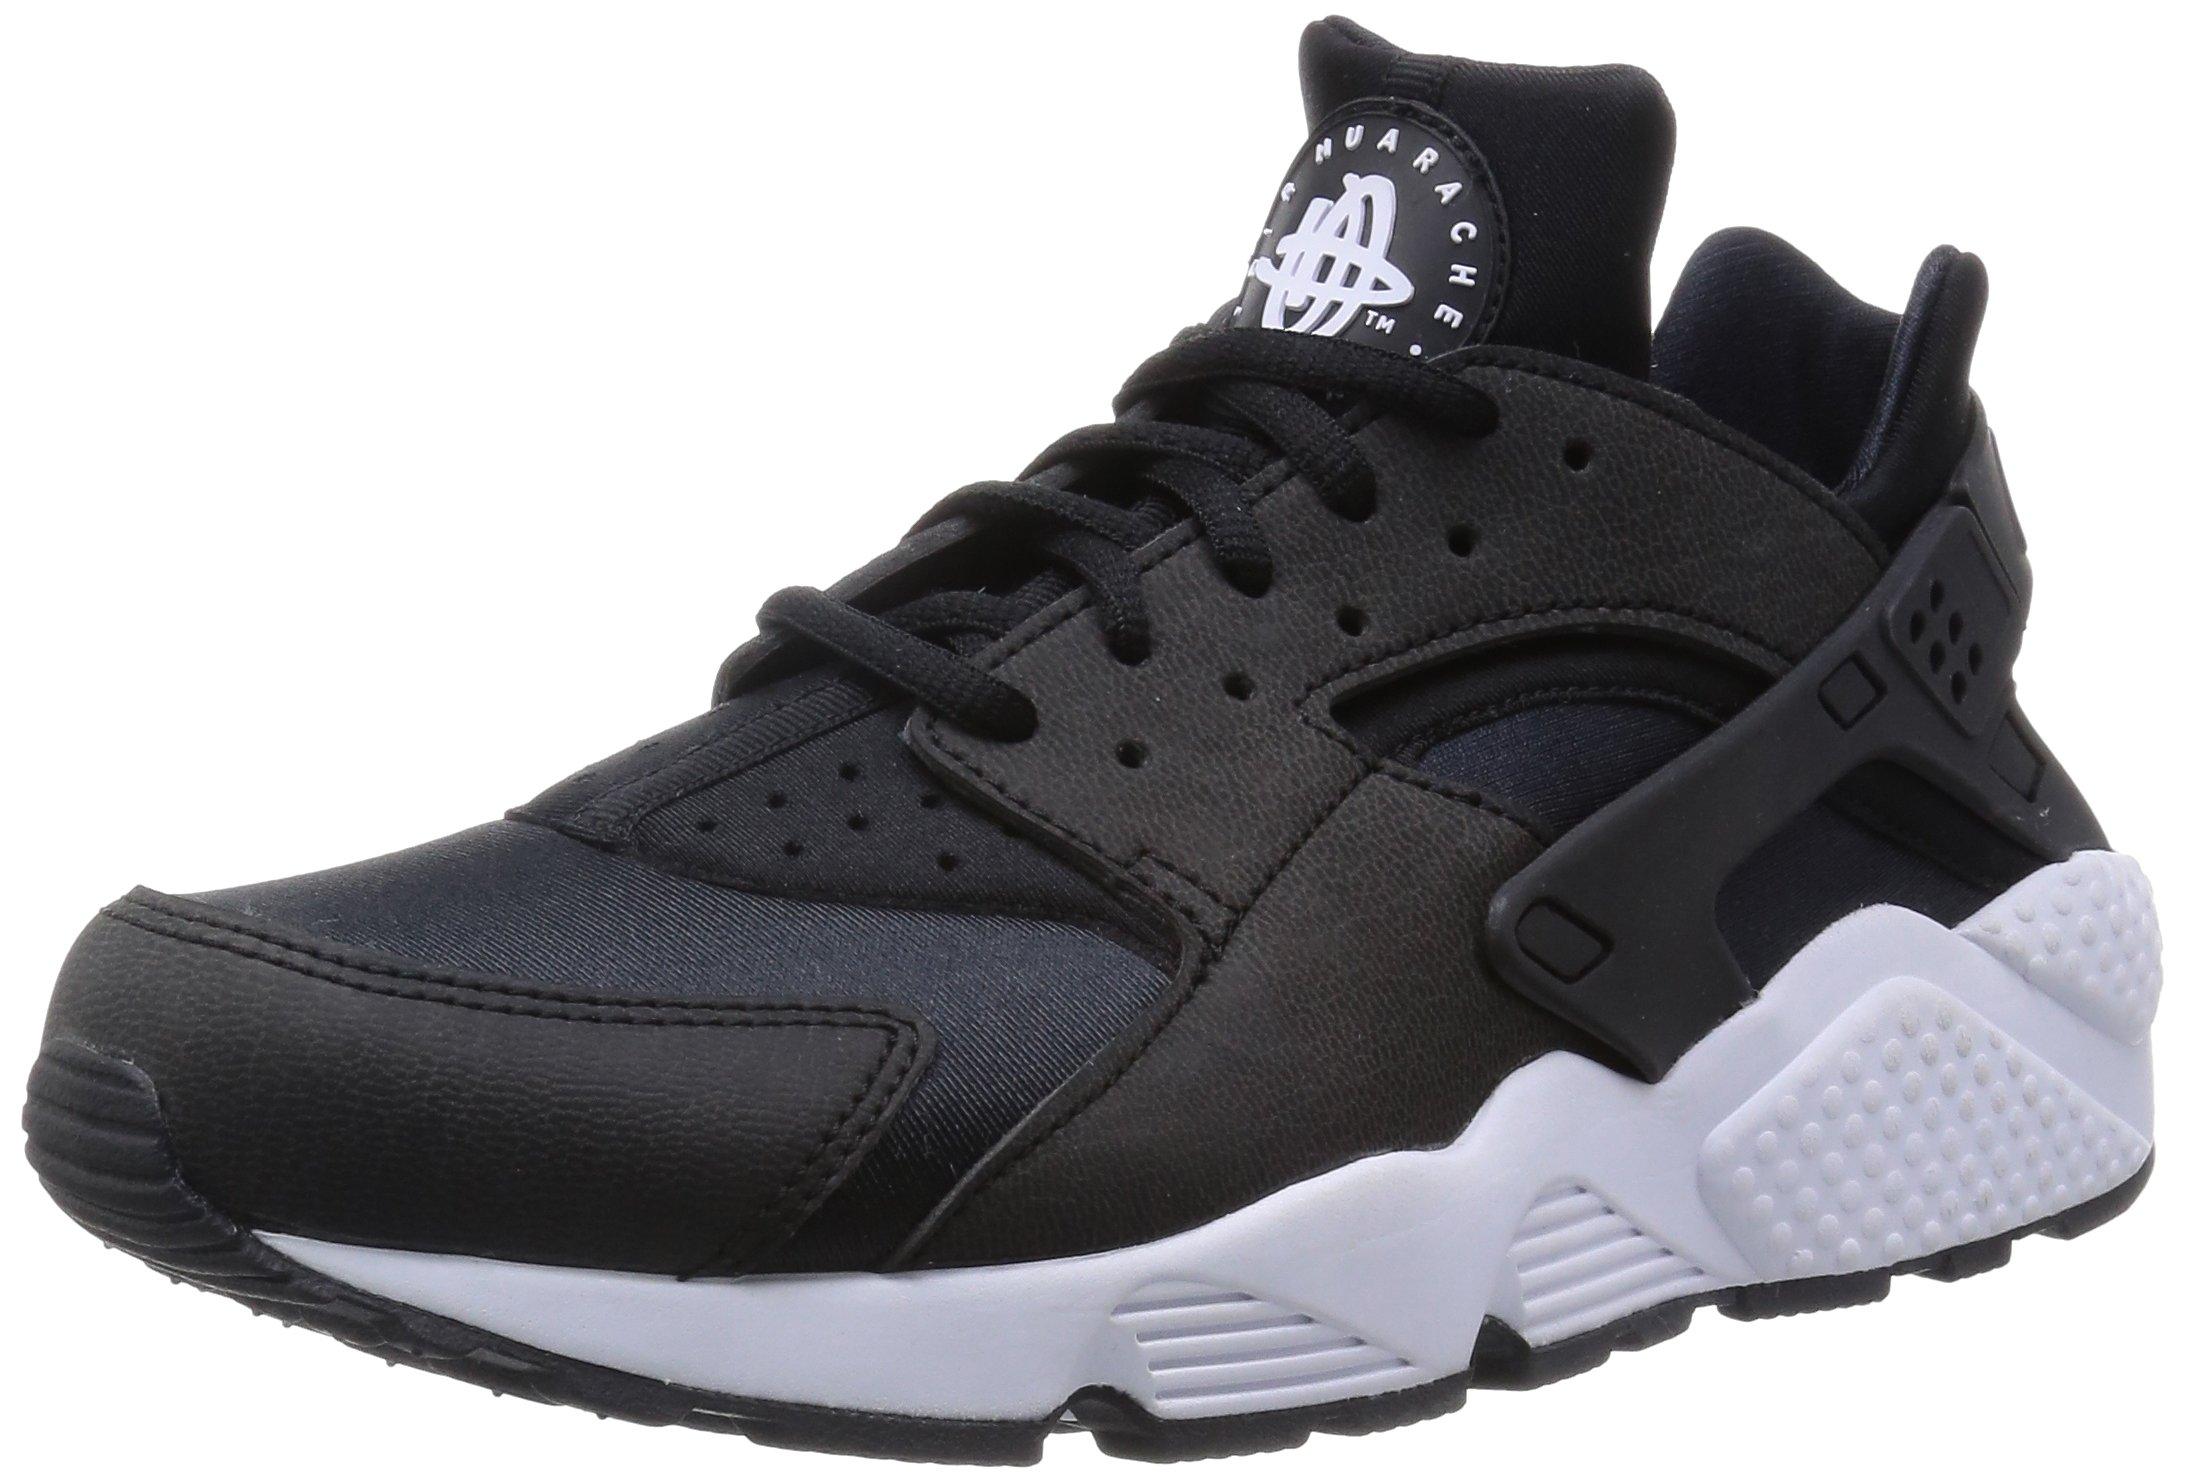 promo code 11194 5ce47 Galleon - Nike Air Huarache Run Womens Trainers Black White - 9 UK